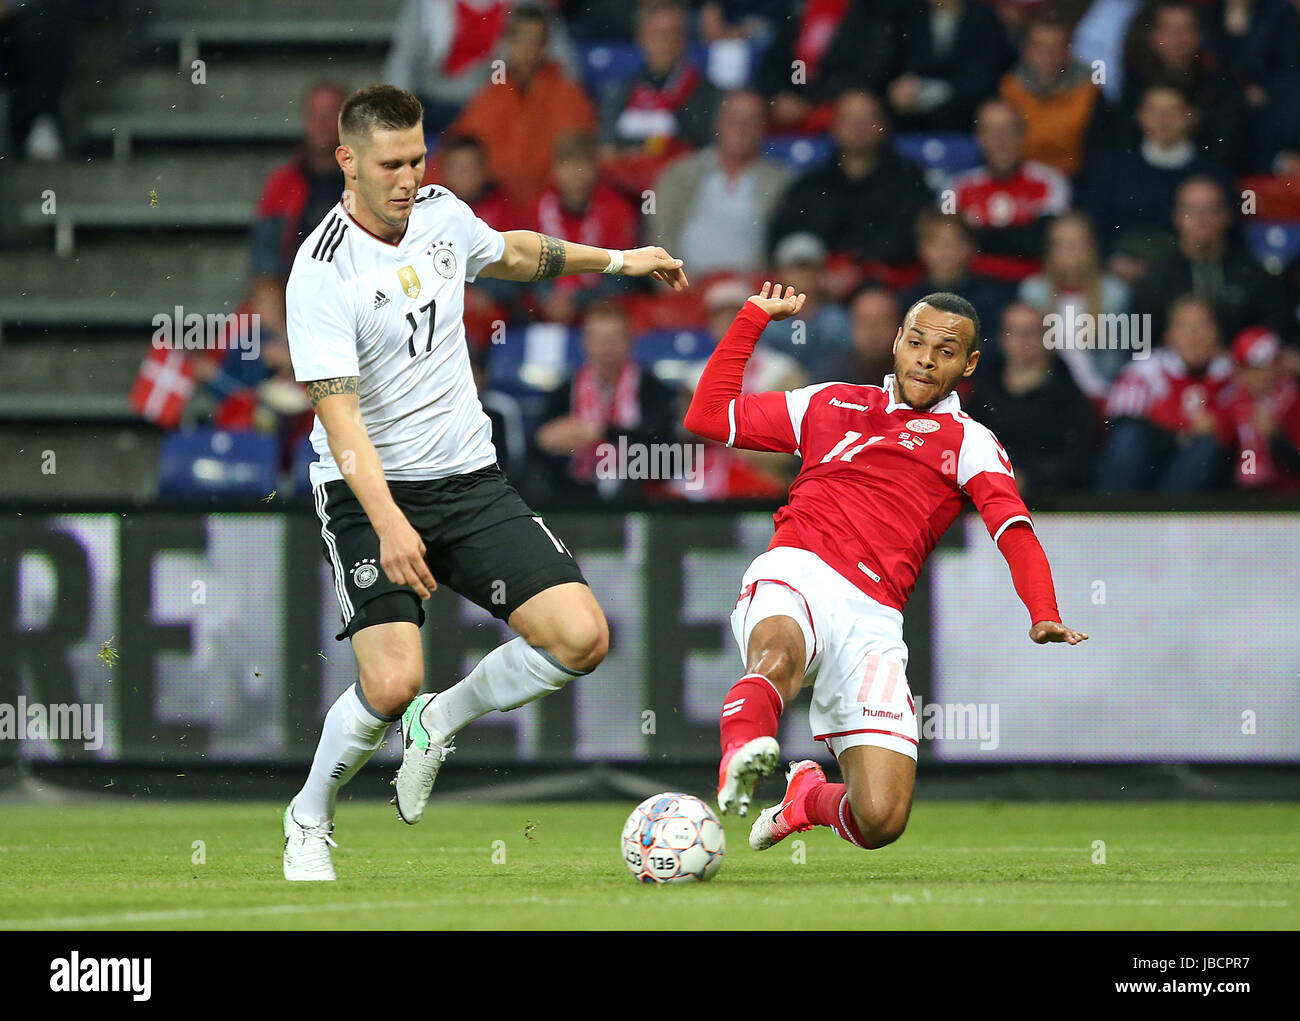 06.06.2017, Fussball Länderspiel, Dänemark - Deutschland, in Brondby Stadion Kopenhagen, v.l. Niklas Süle (Deutschland) Stock Photo